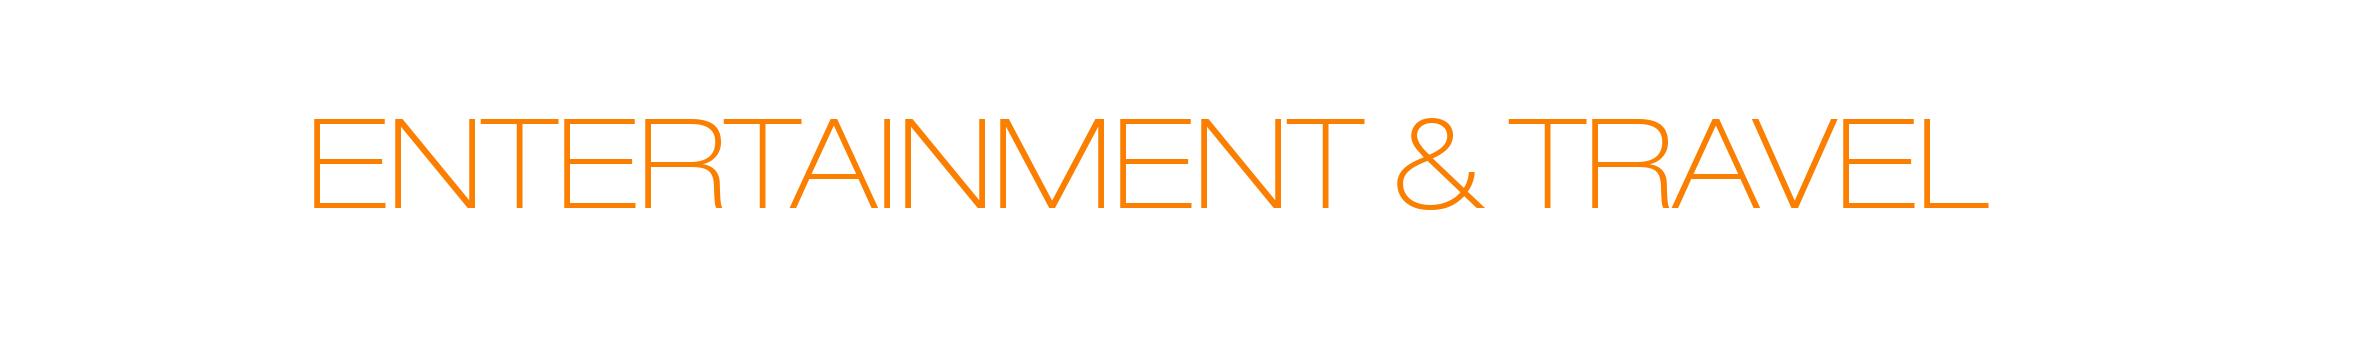 Entertainment & Travel - 1 - Title.jpg